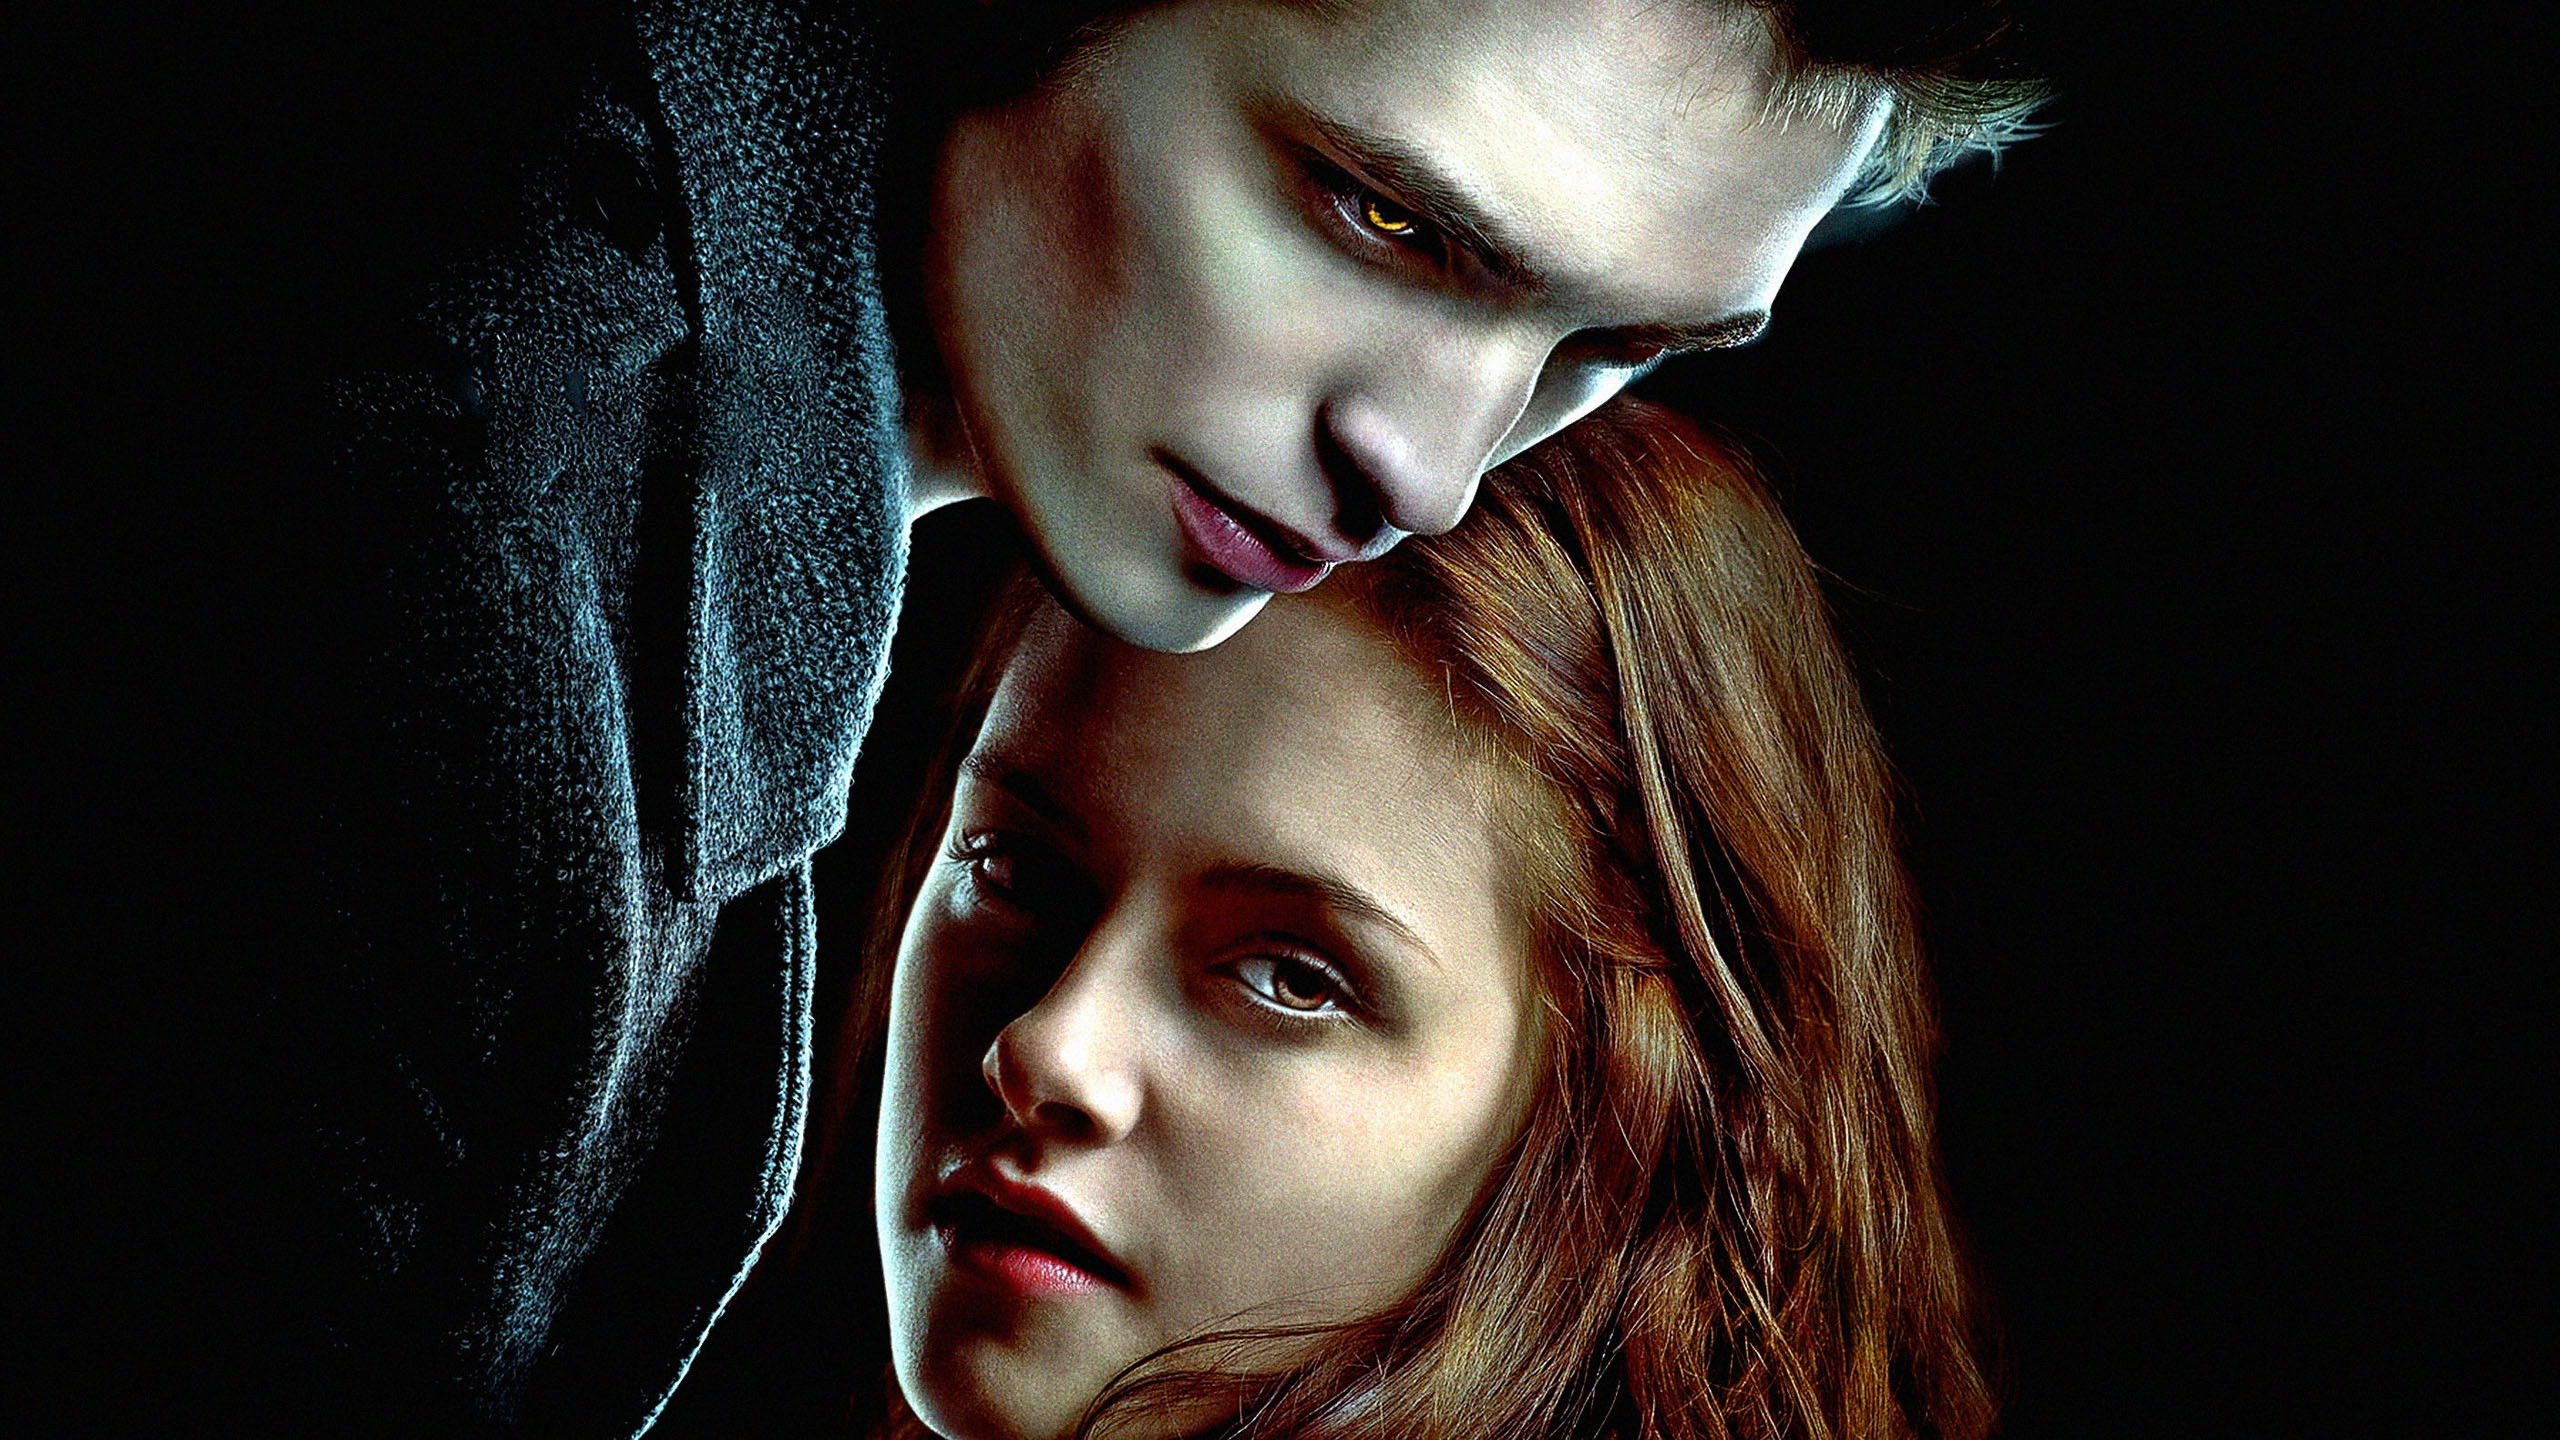 Robert pattinson twilight wallpaper - Twilight wallpaper ...